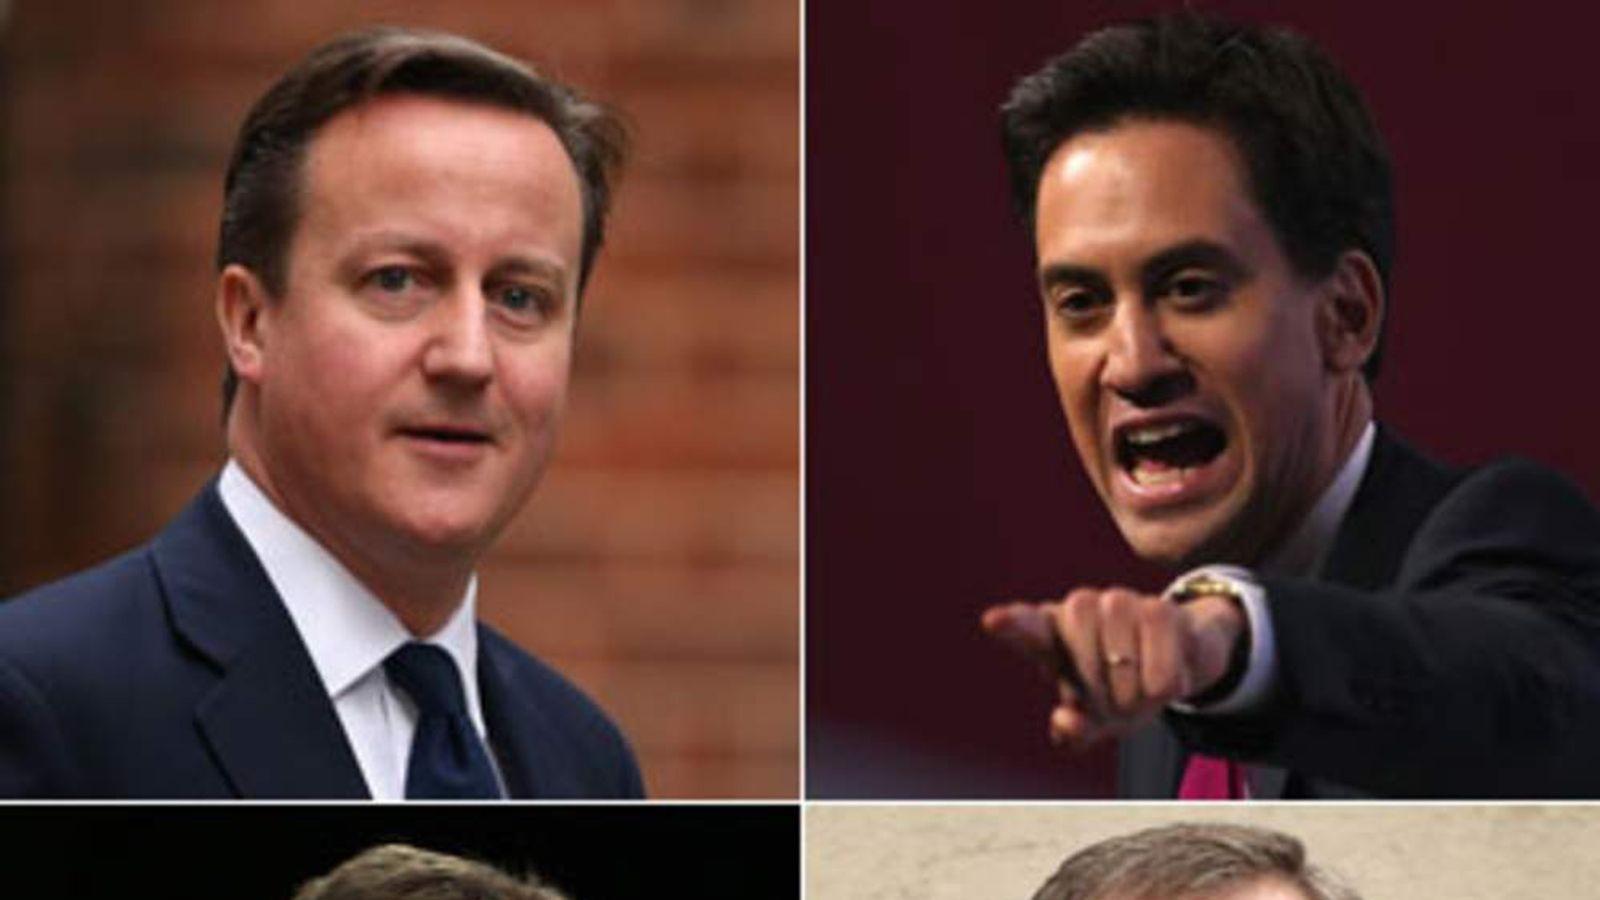 David Cameron, Ed Miliband, Nick Clegg and Nigel Farage